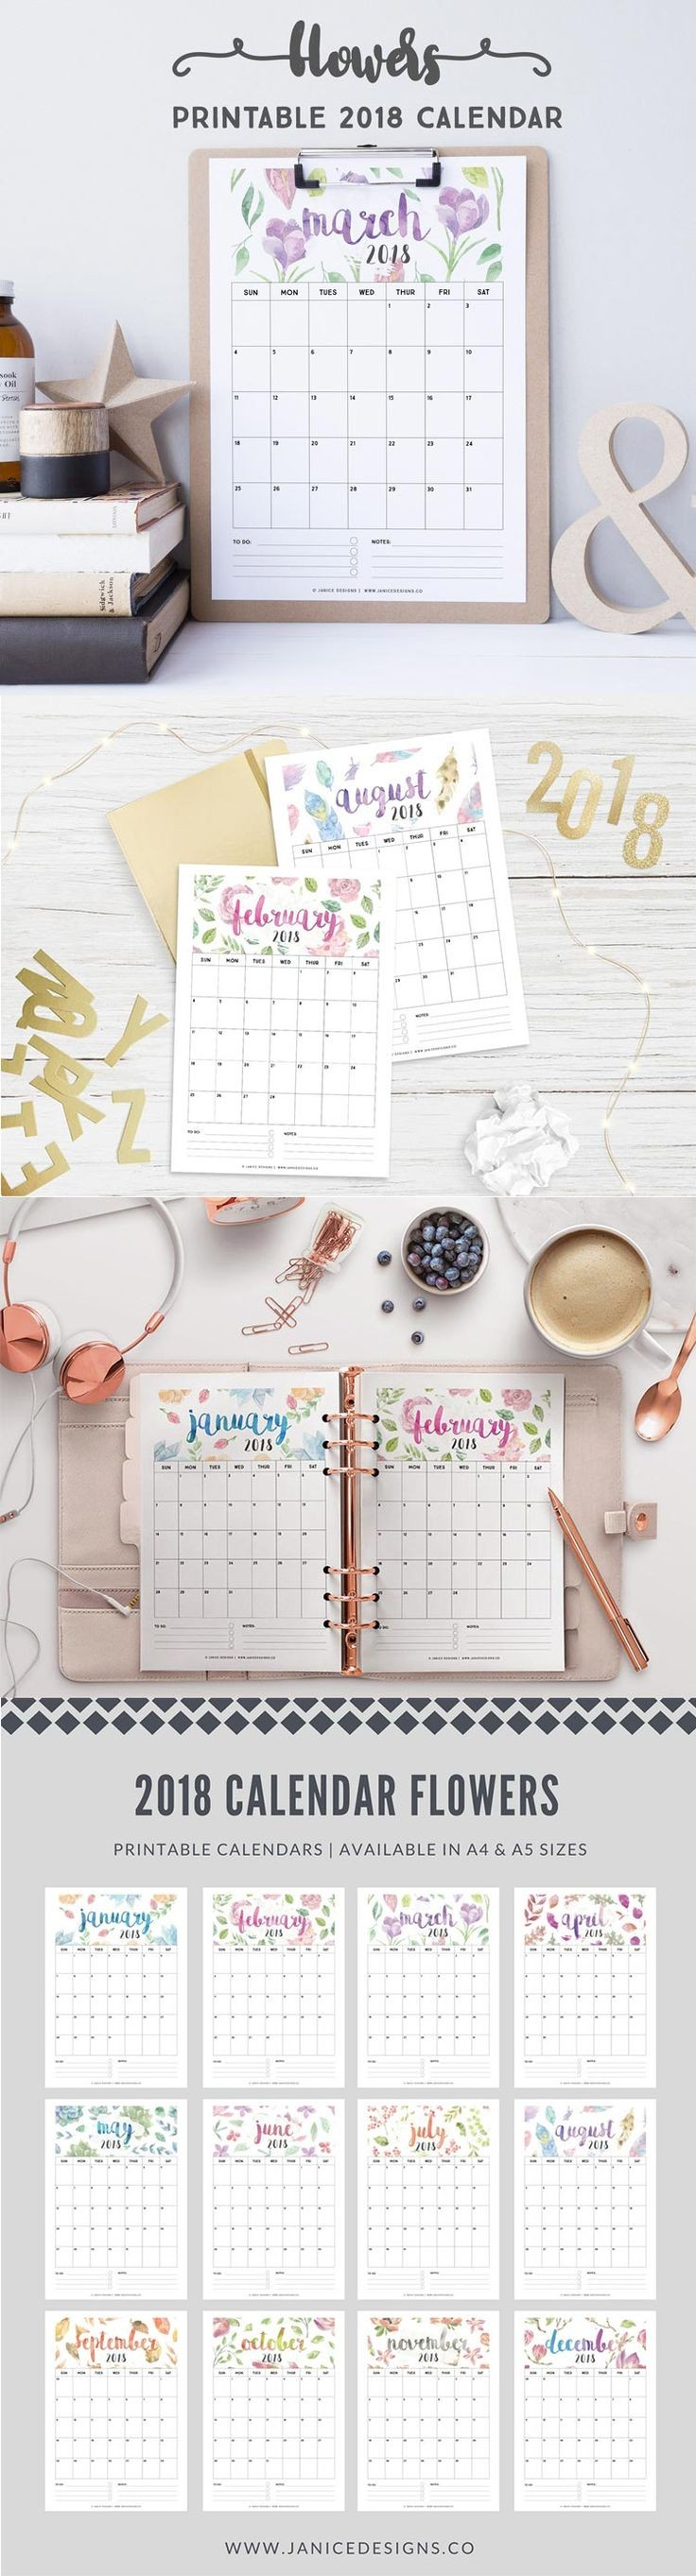 2018 Calendar Flowers